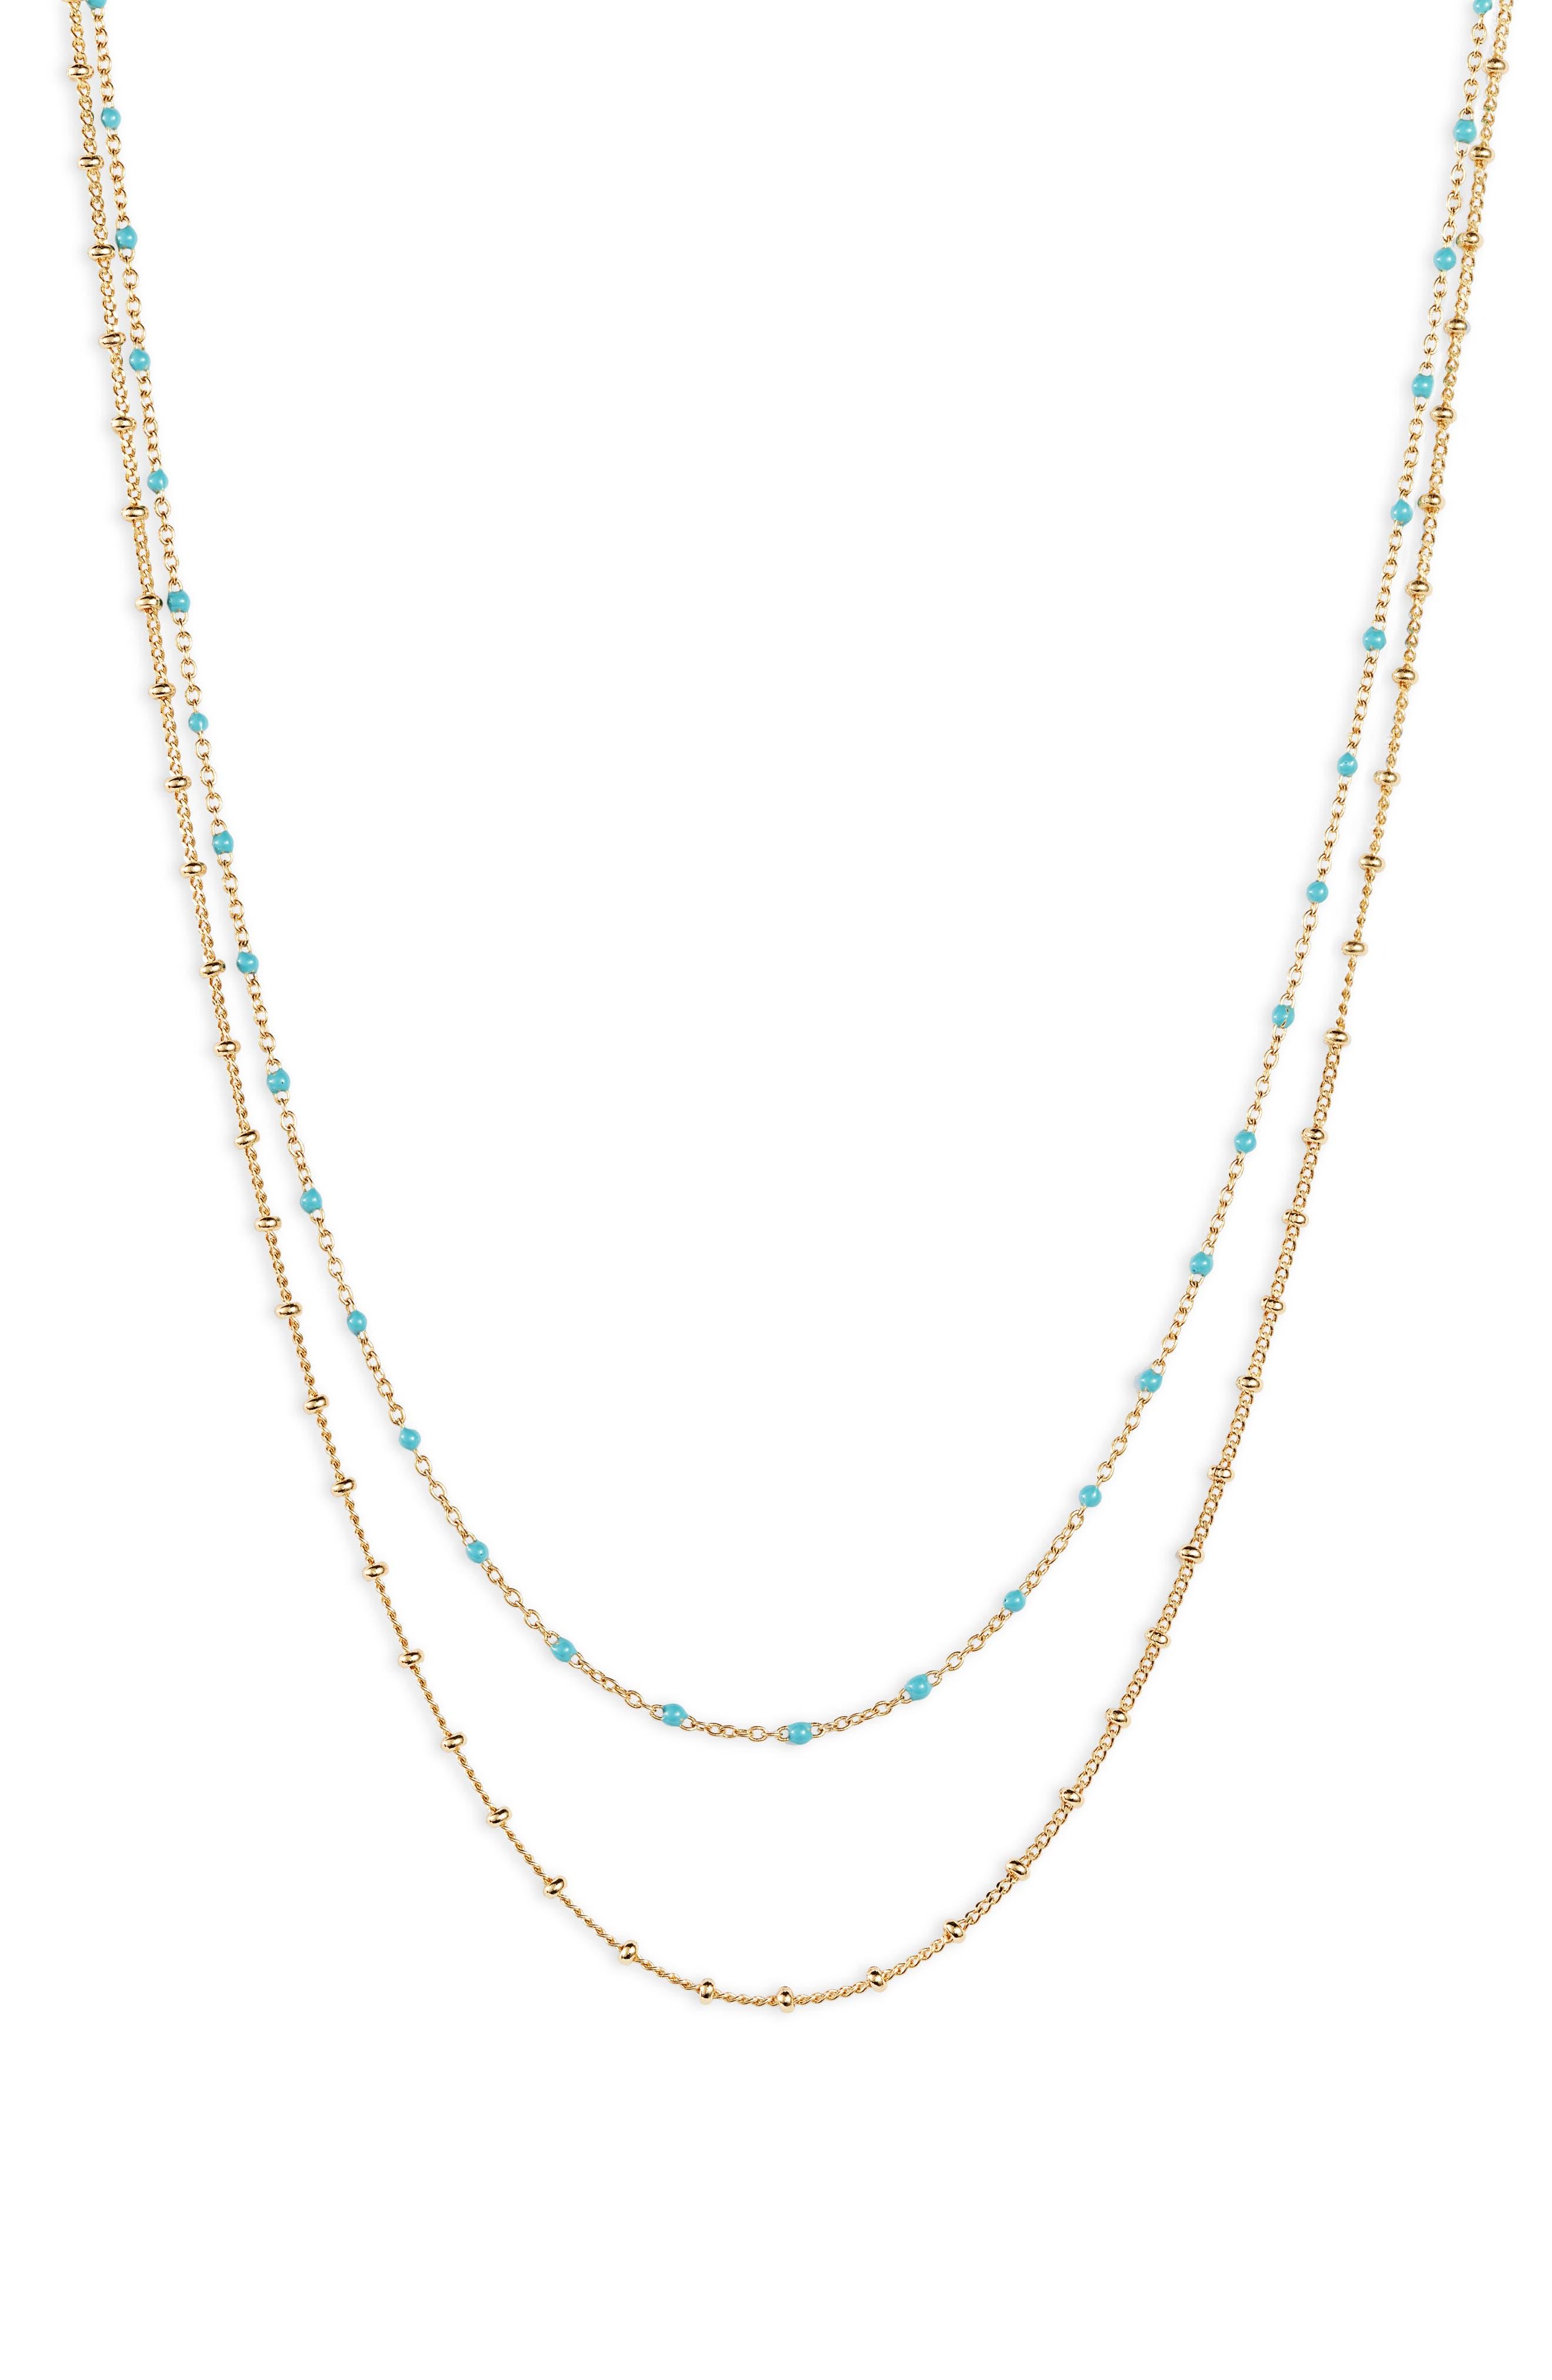 Capri Layered Necklace